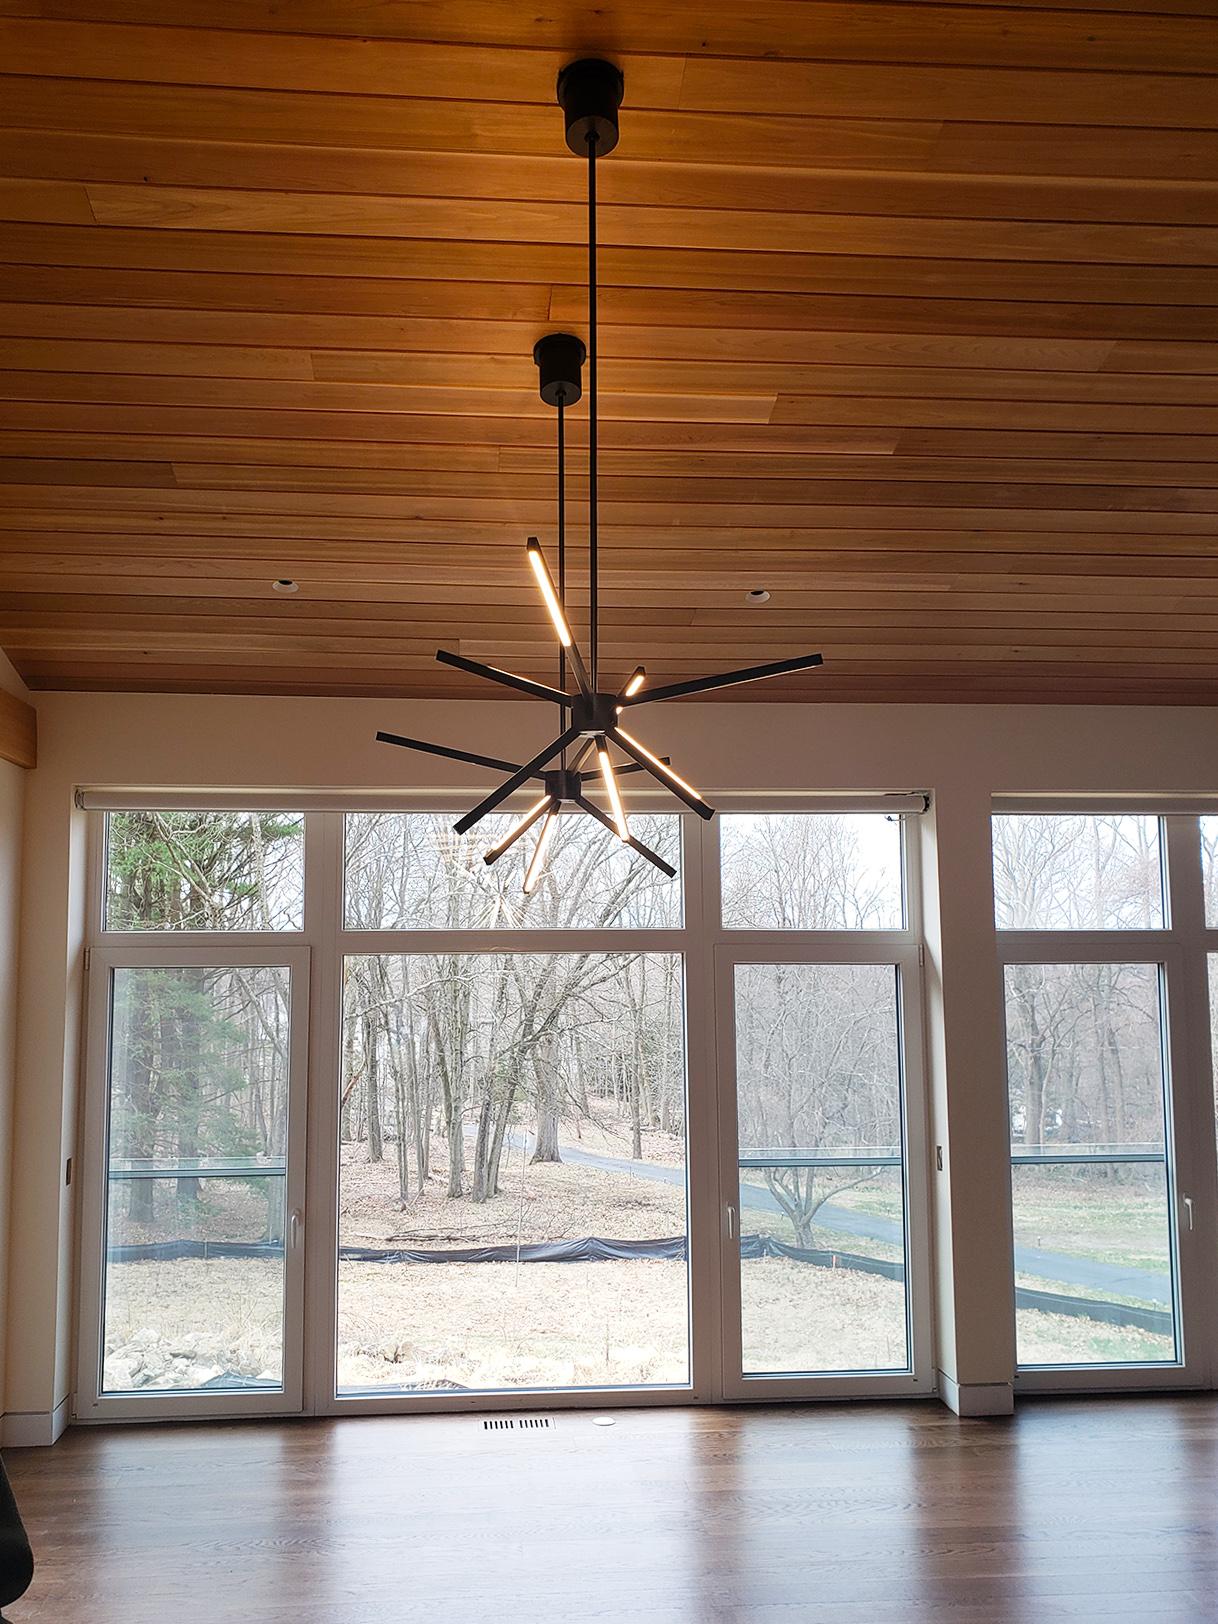 dining room window and chandelier 4.11.19.jpg